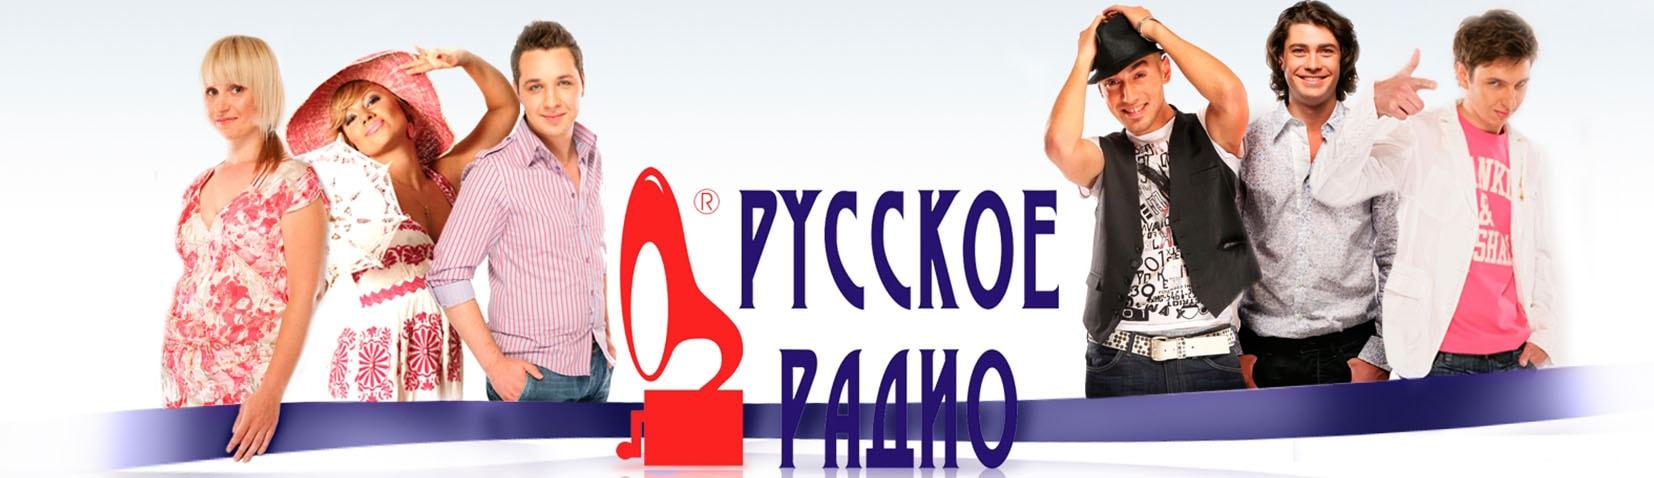 Реклама на Русское радио Владикавказ цена